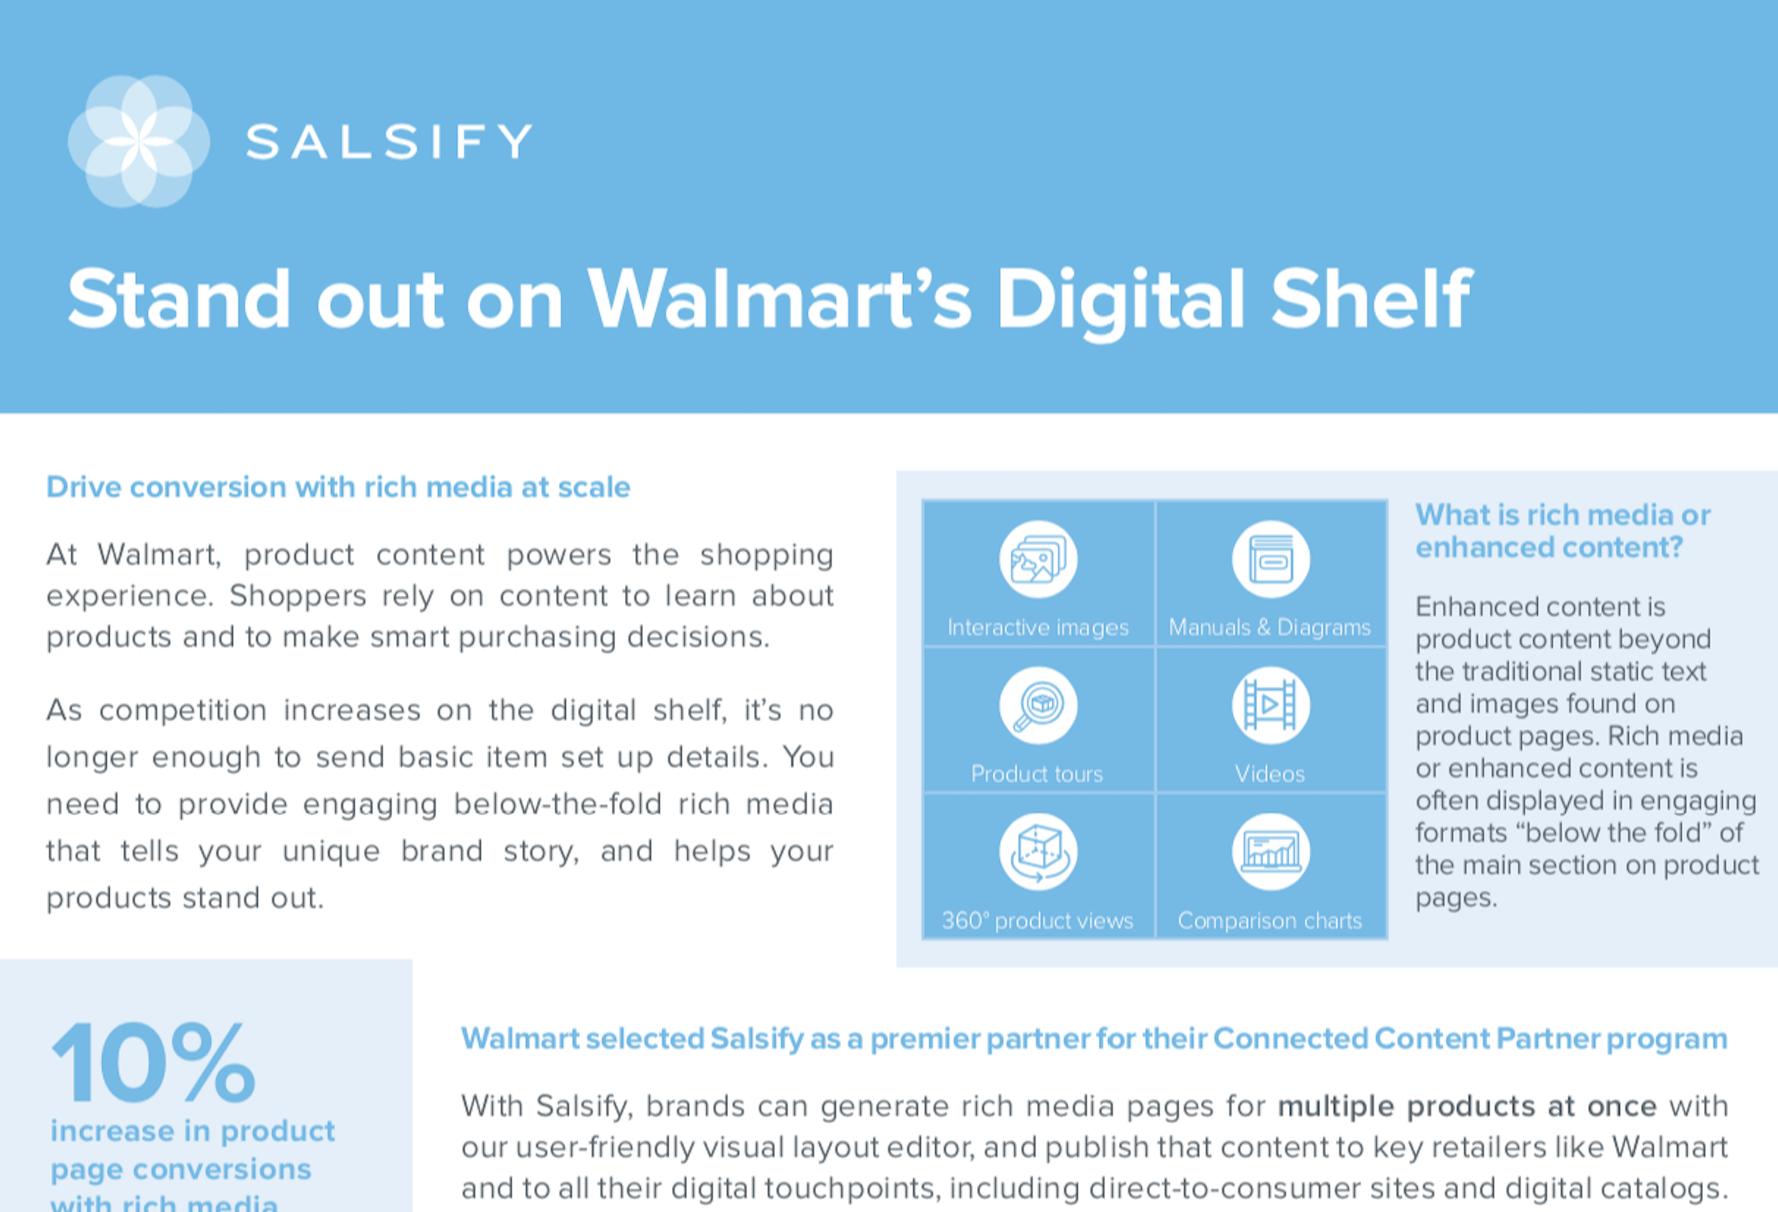 stand out on walmart's digital shelf